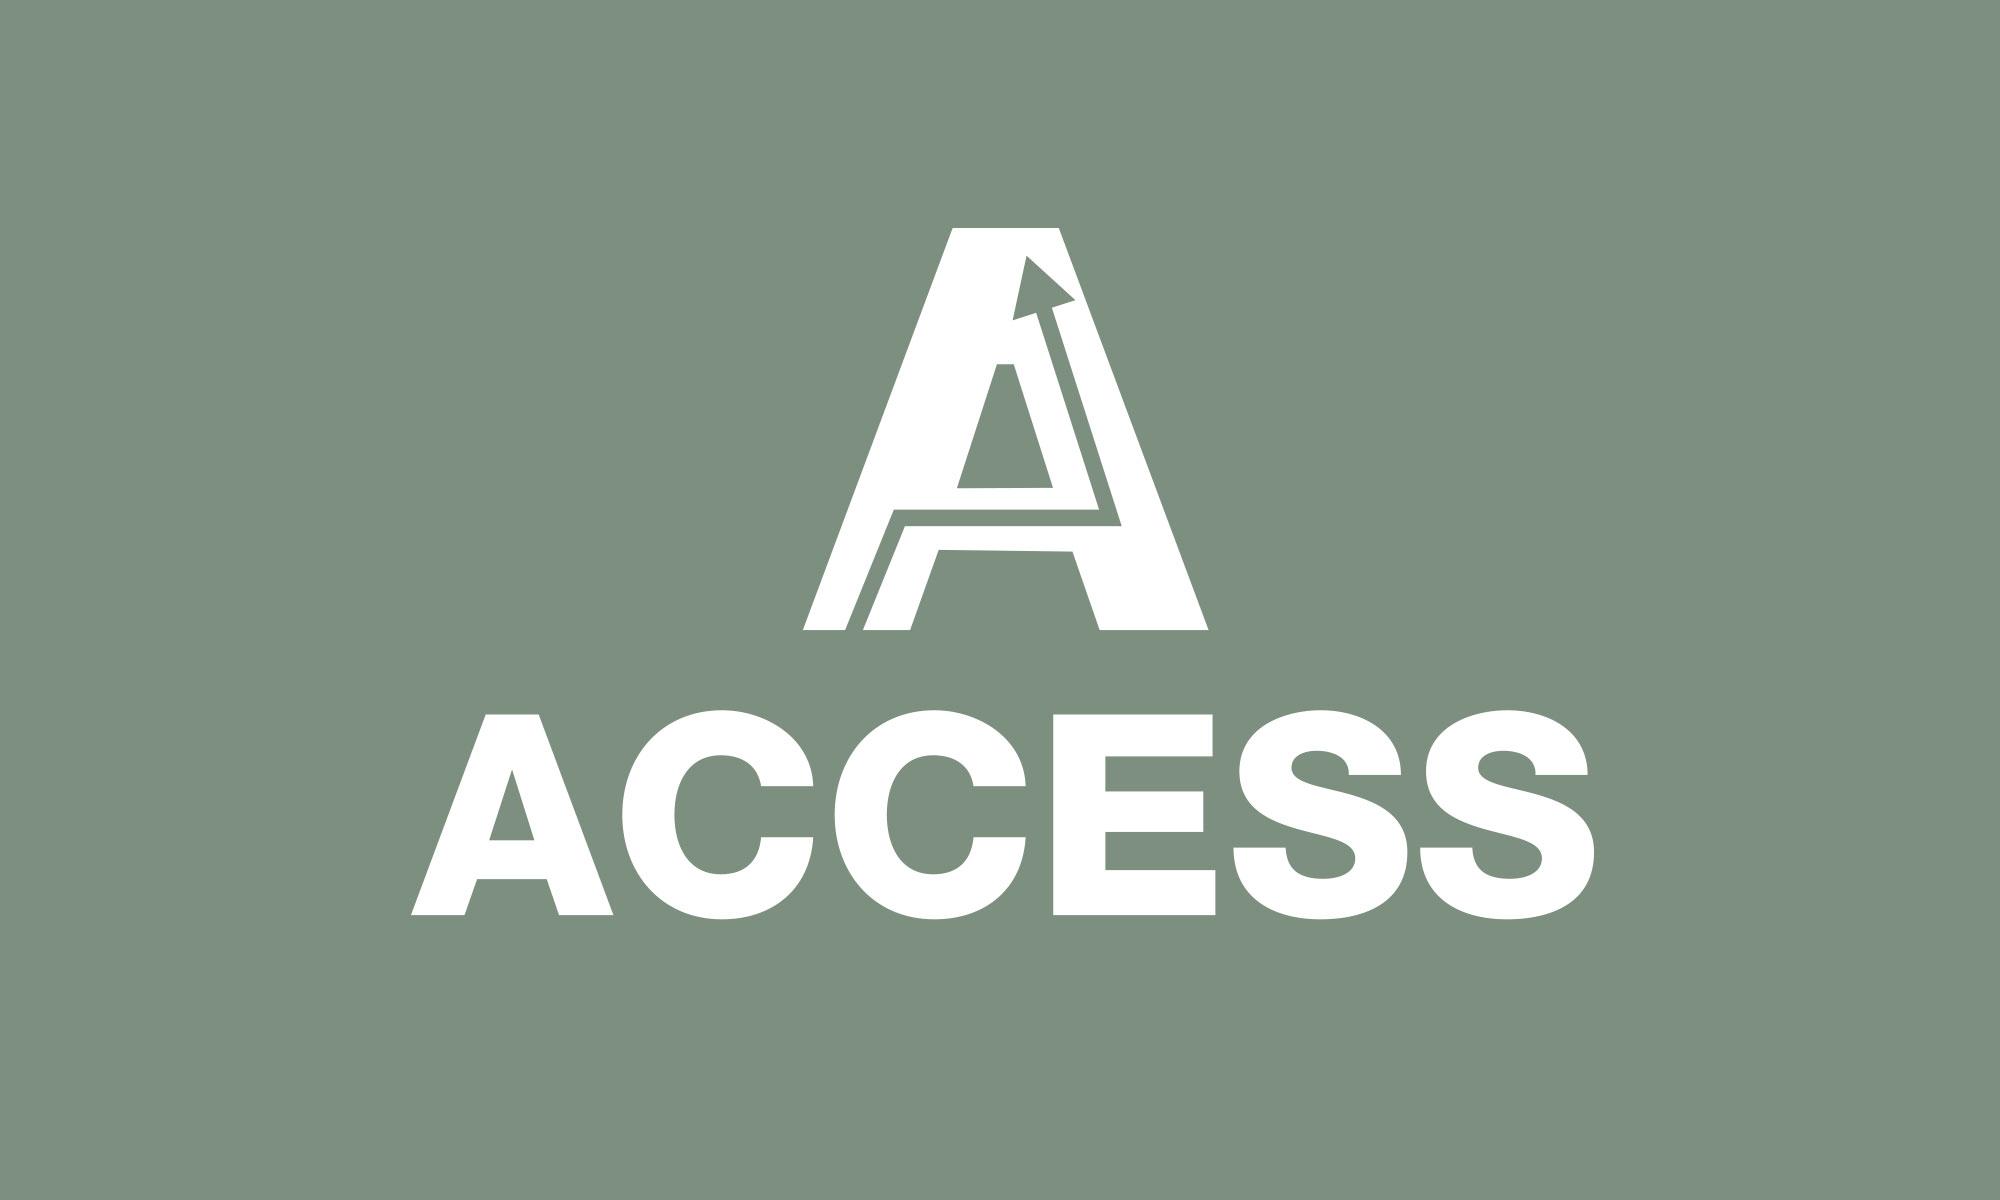 Access logo reverse